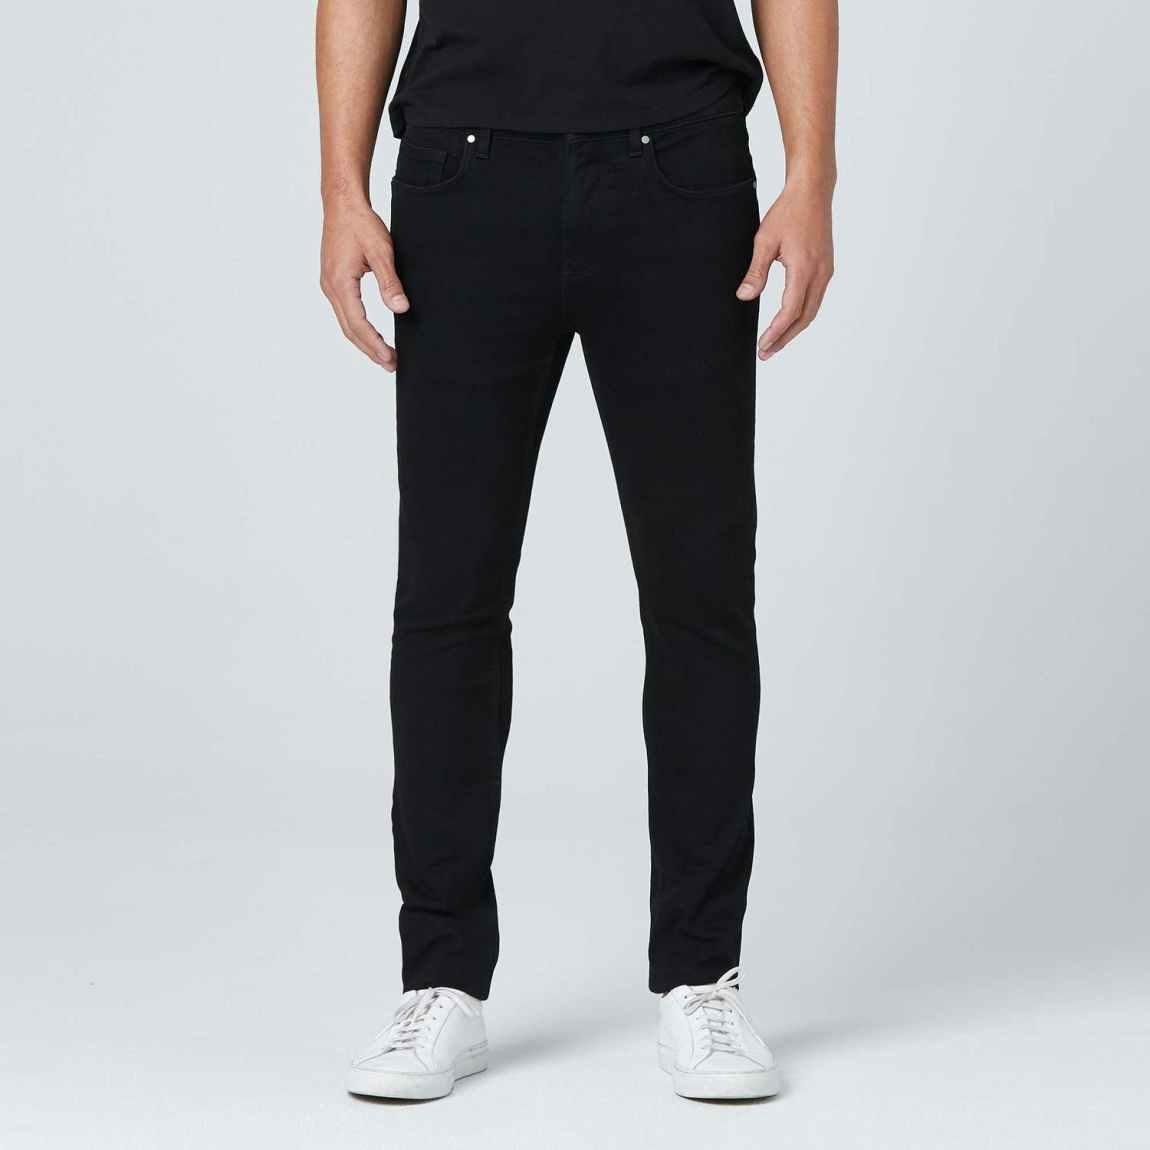 dstld, dstld jeans, black jeans, skinny jeans, stretch denim, black denim